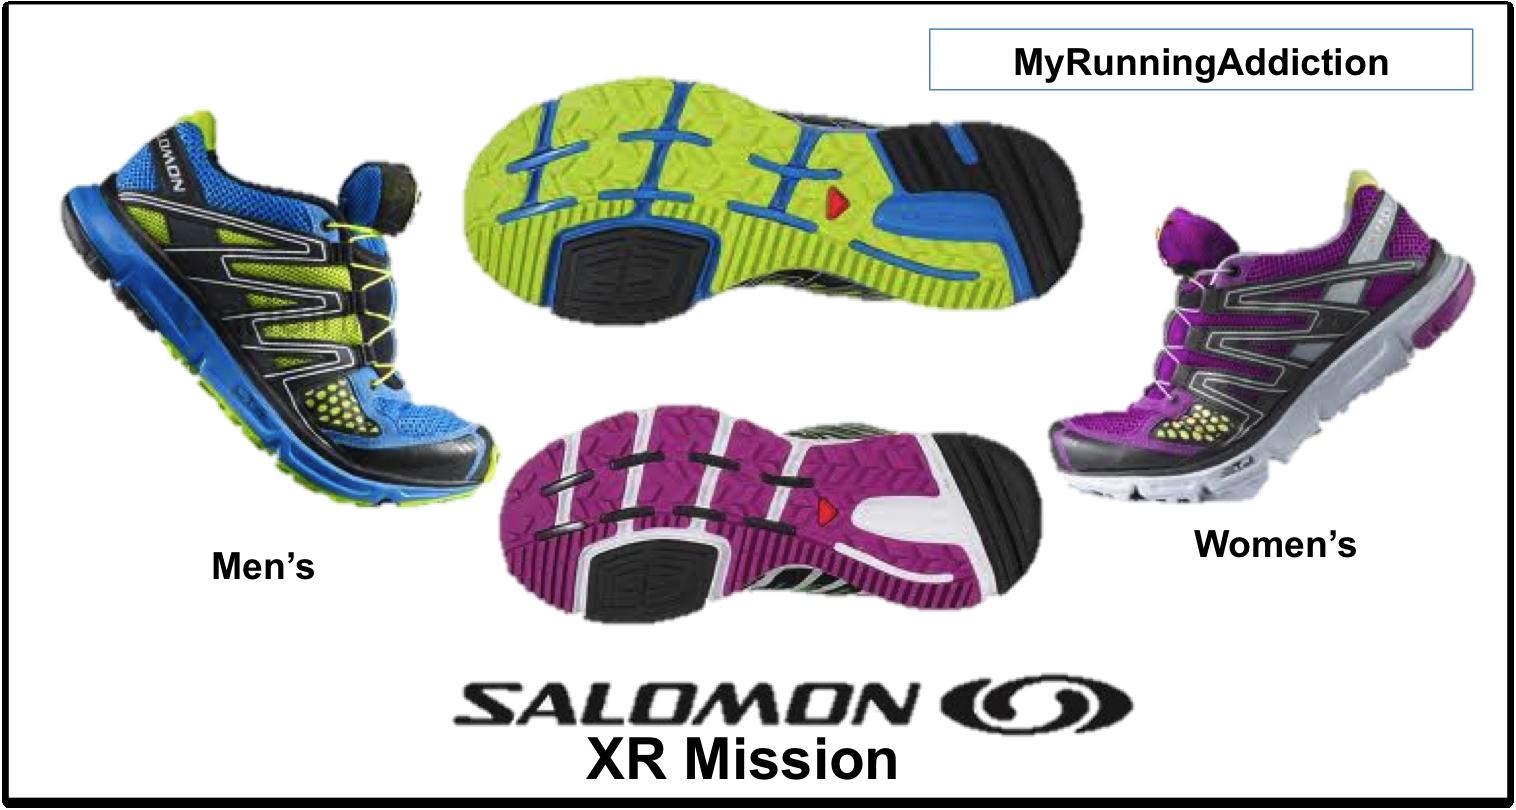 ShoeMy Mission Hybrid Door Trail Running To Xr ReviewSalomon mnOv8ywN0